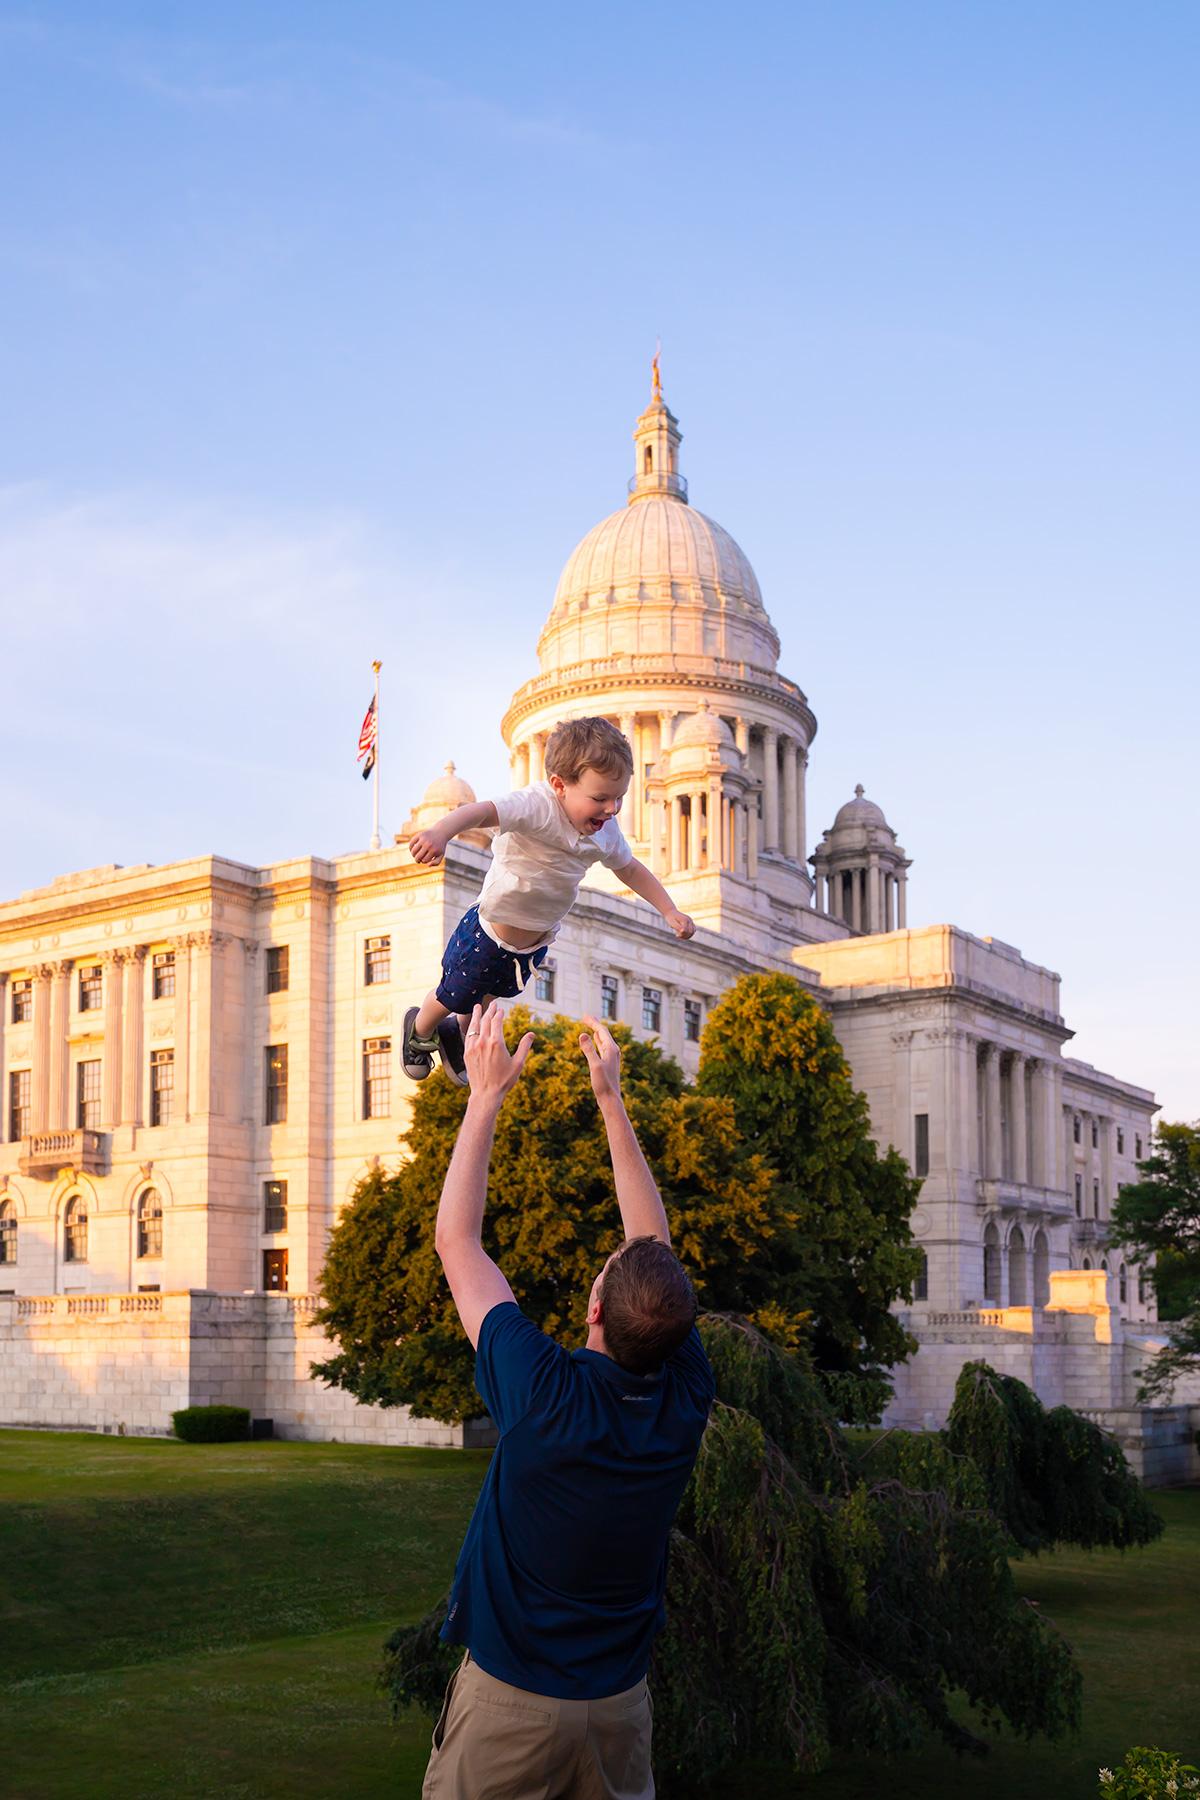 Rhode-Island-State-House-Providence-RI